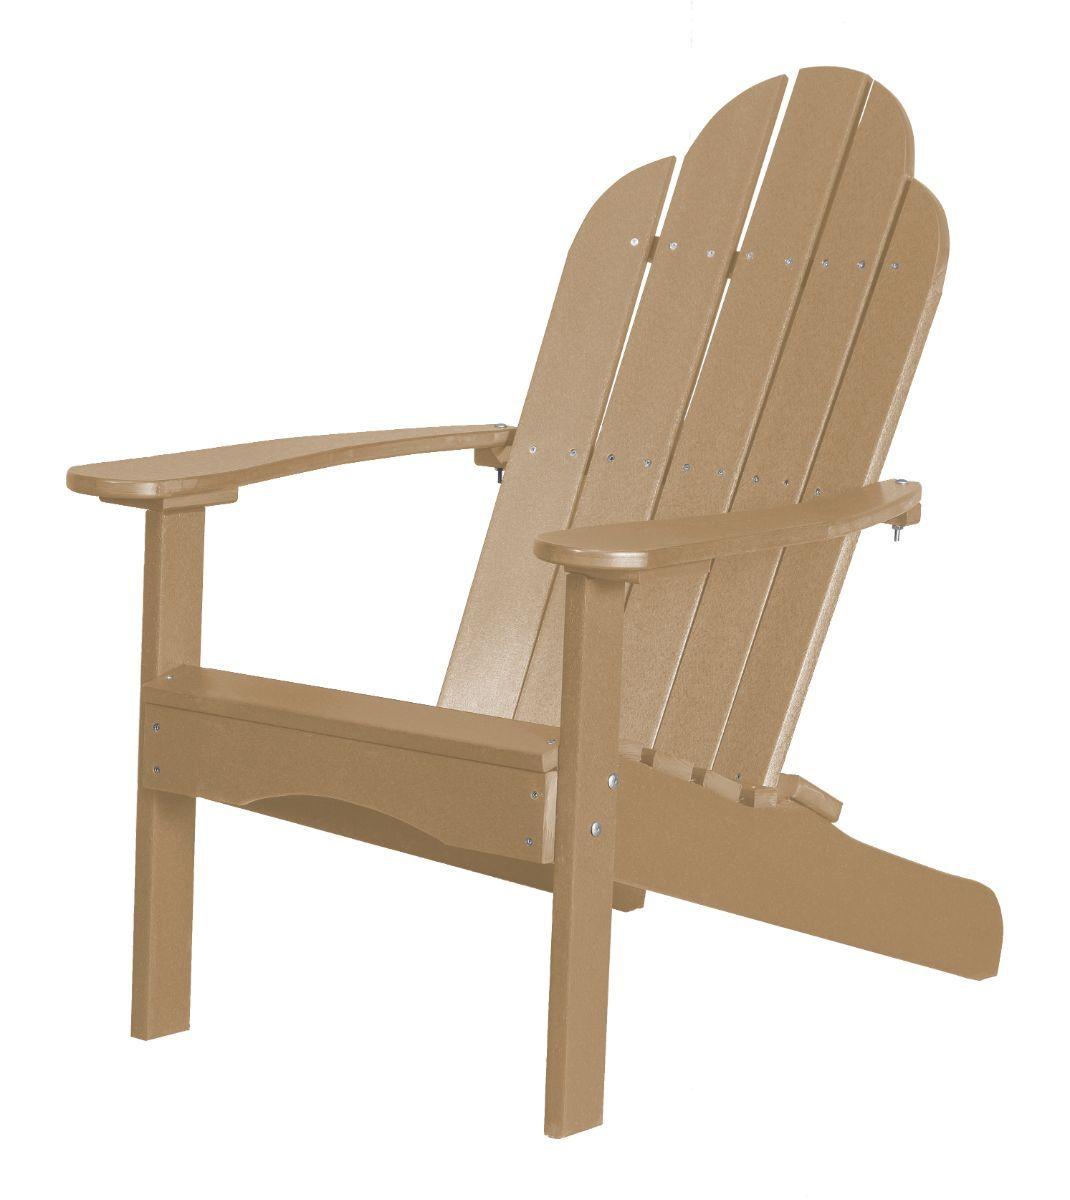 Weathered Wood Odessa Adirondack Chair